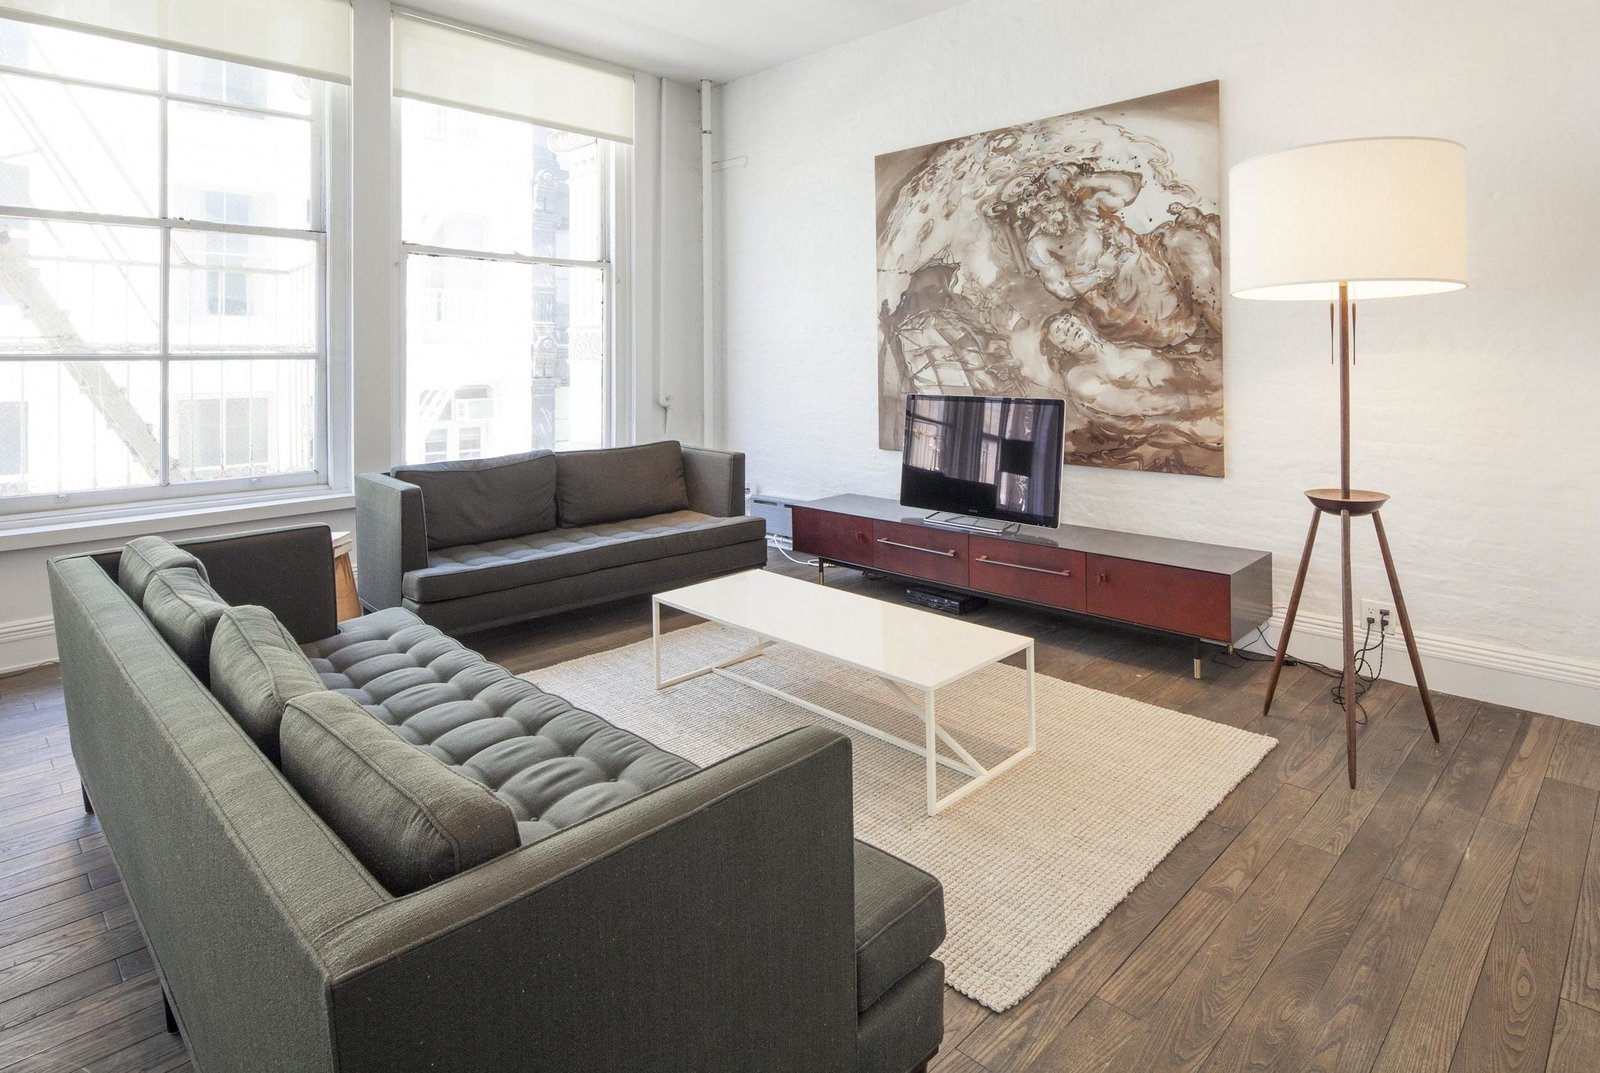 Living Room, End Tables, Sofa, Rug Floor, Medium Hardwood Floor, Coffee Tables, Floor Lighting, and Media Cabinet  Prince Street